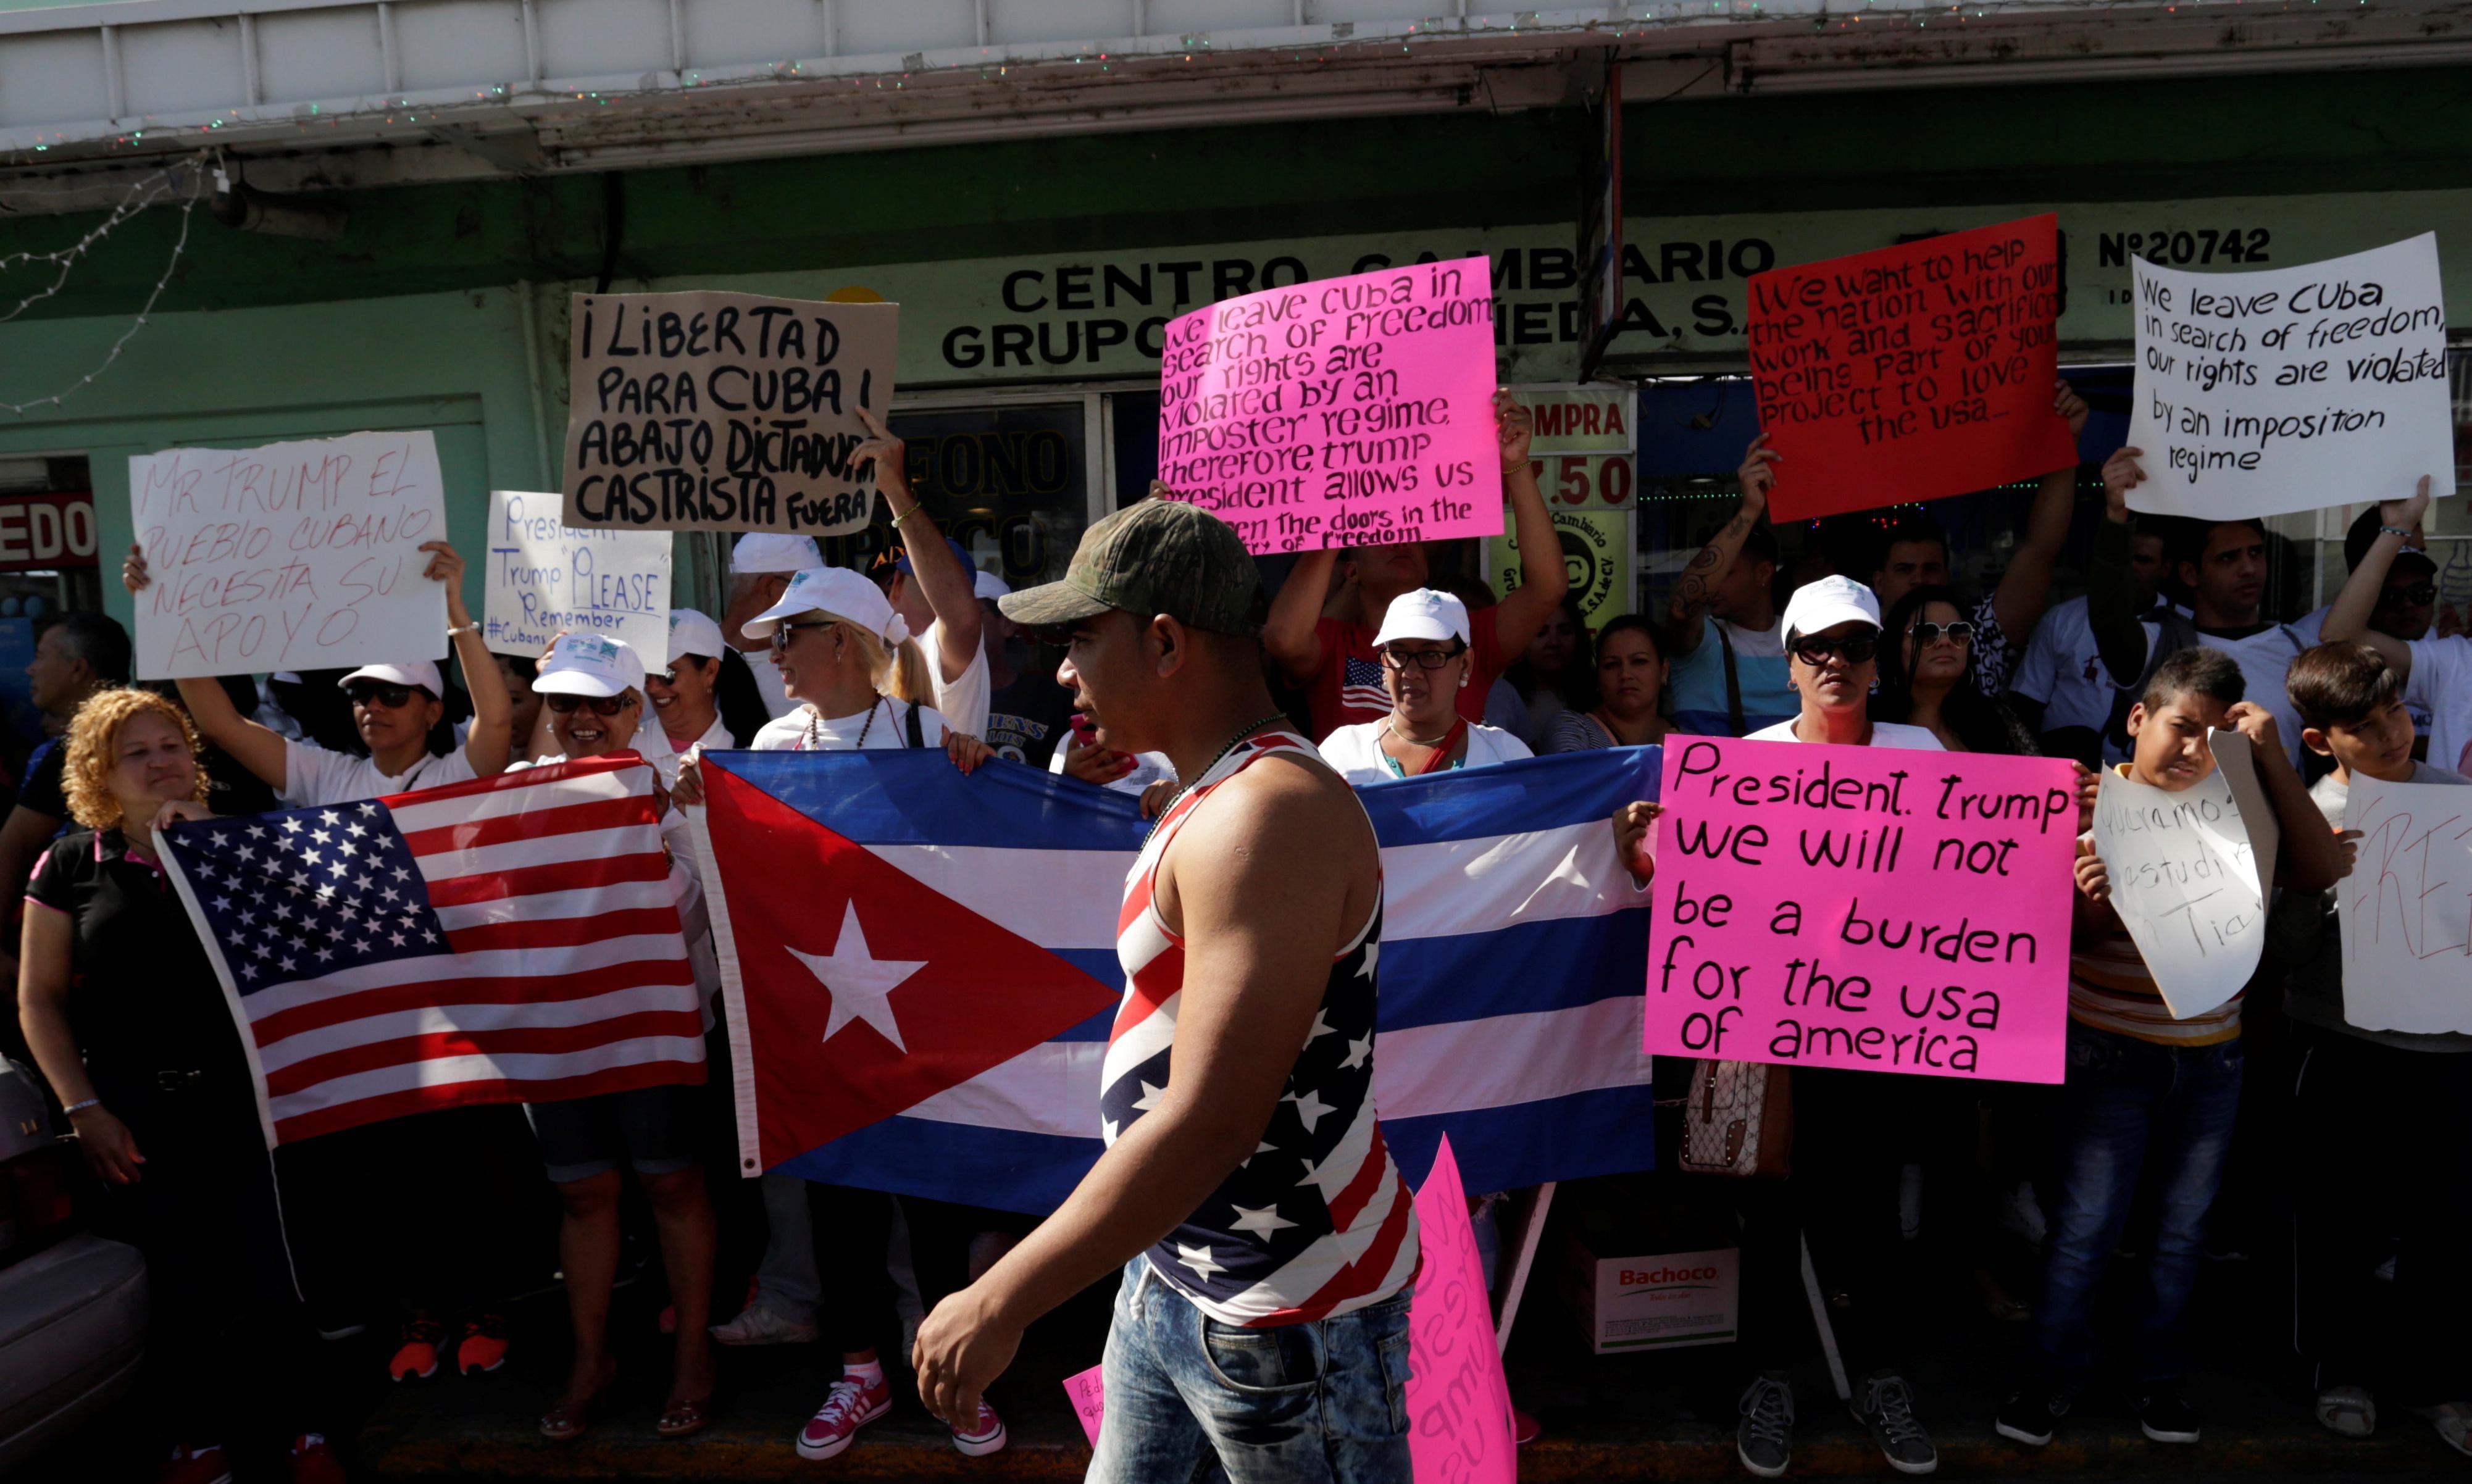 More Cubans seek asylum in Mexico amid clampdown on legal path to US